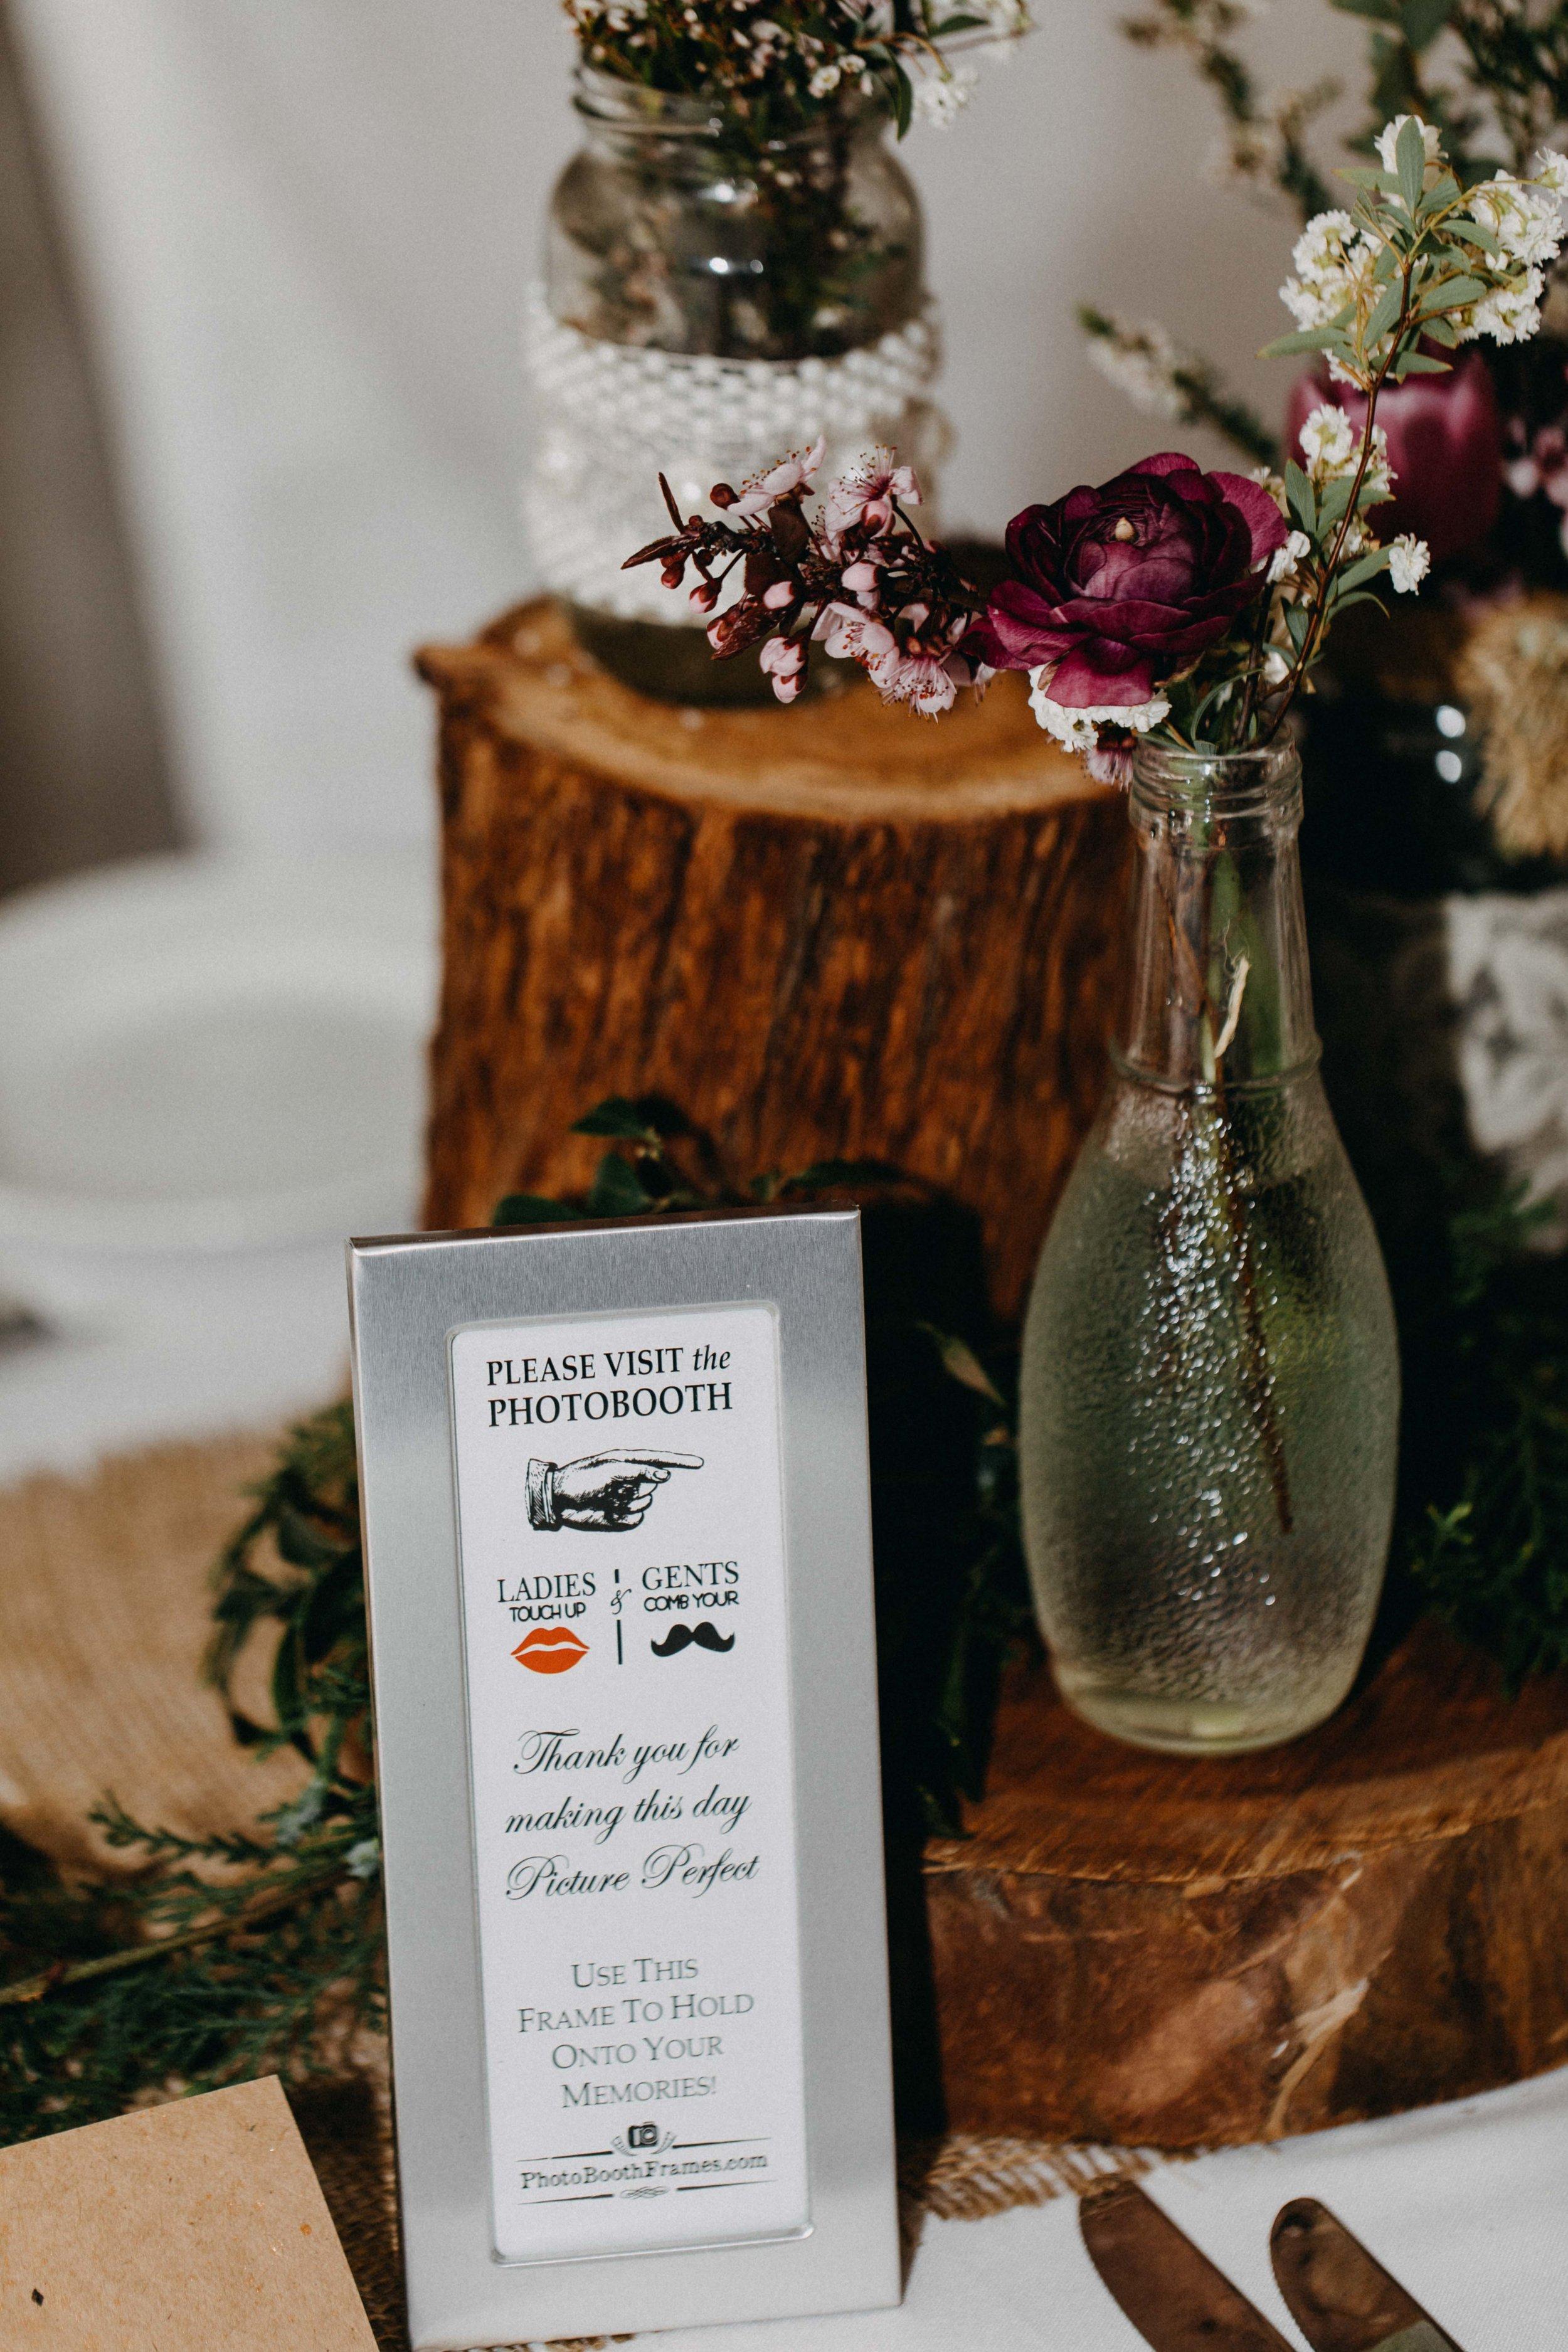 appin-house-wedding-macarthur-www.emilyobrienphotography.net-56.jpg